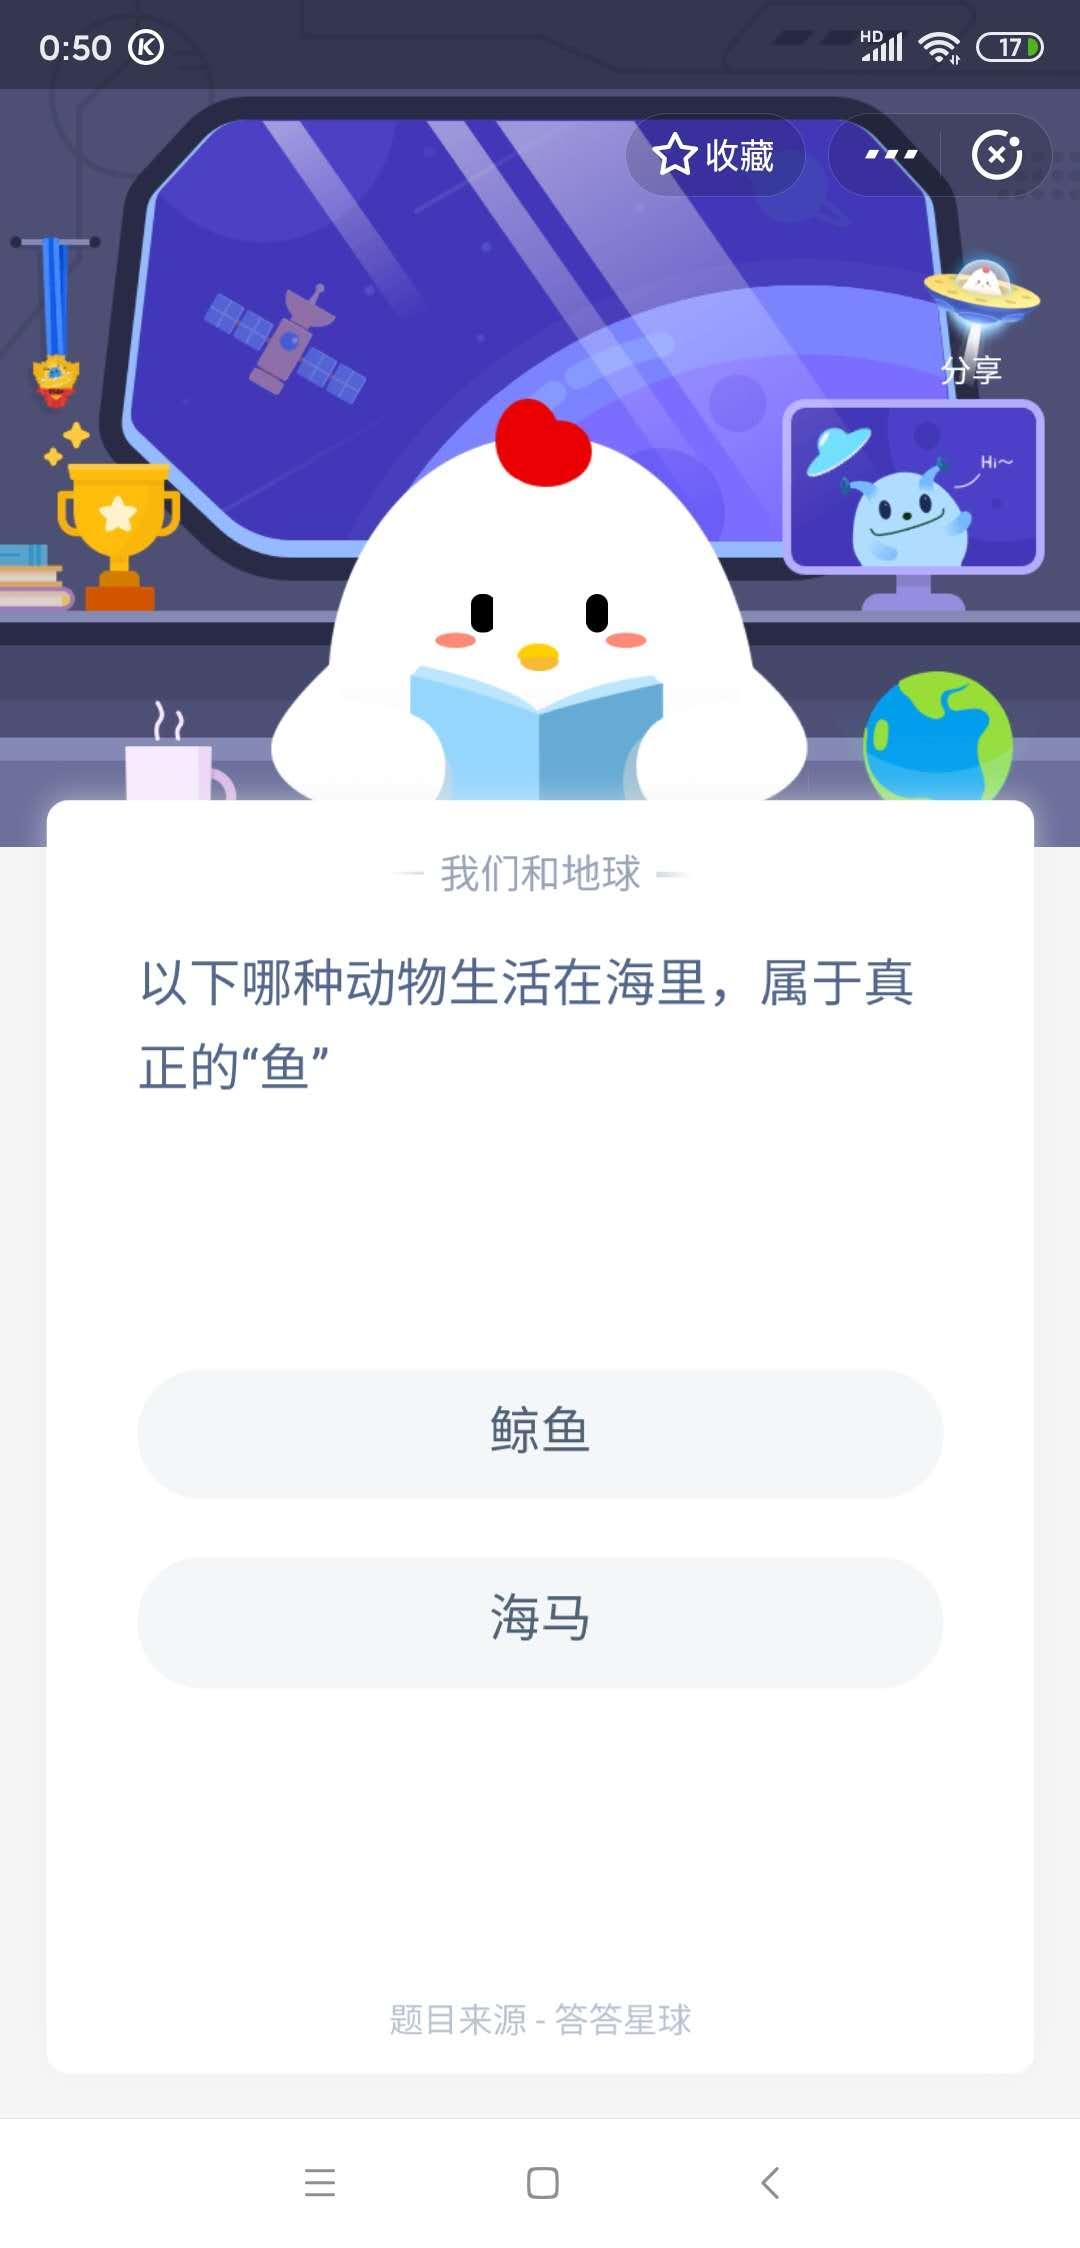 http://www.gyw007.com/nanhaifangchan/510270.html